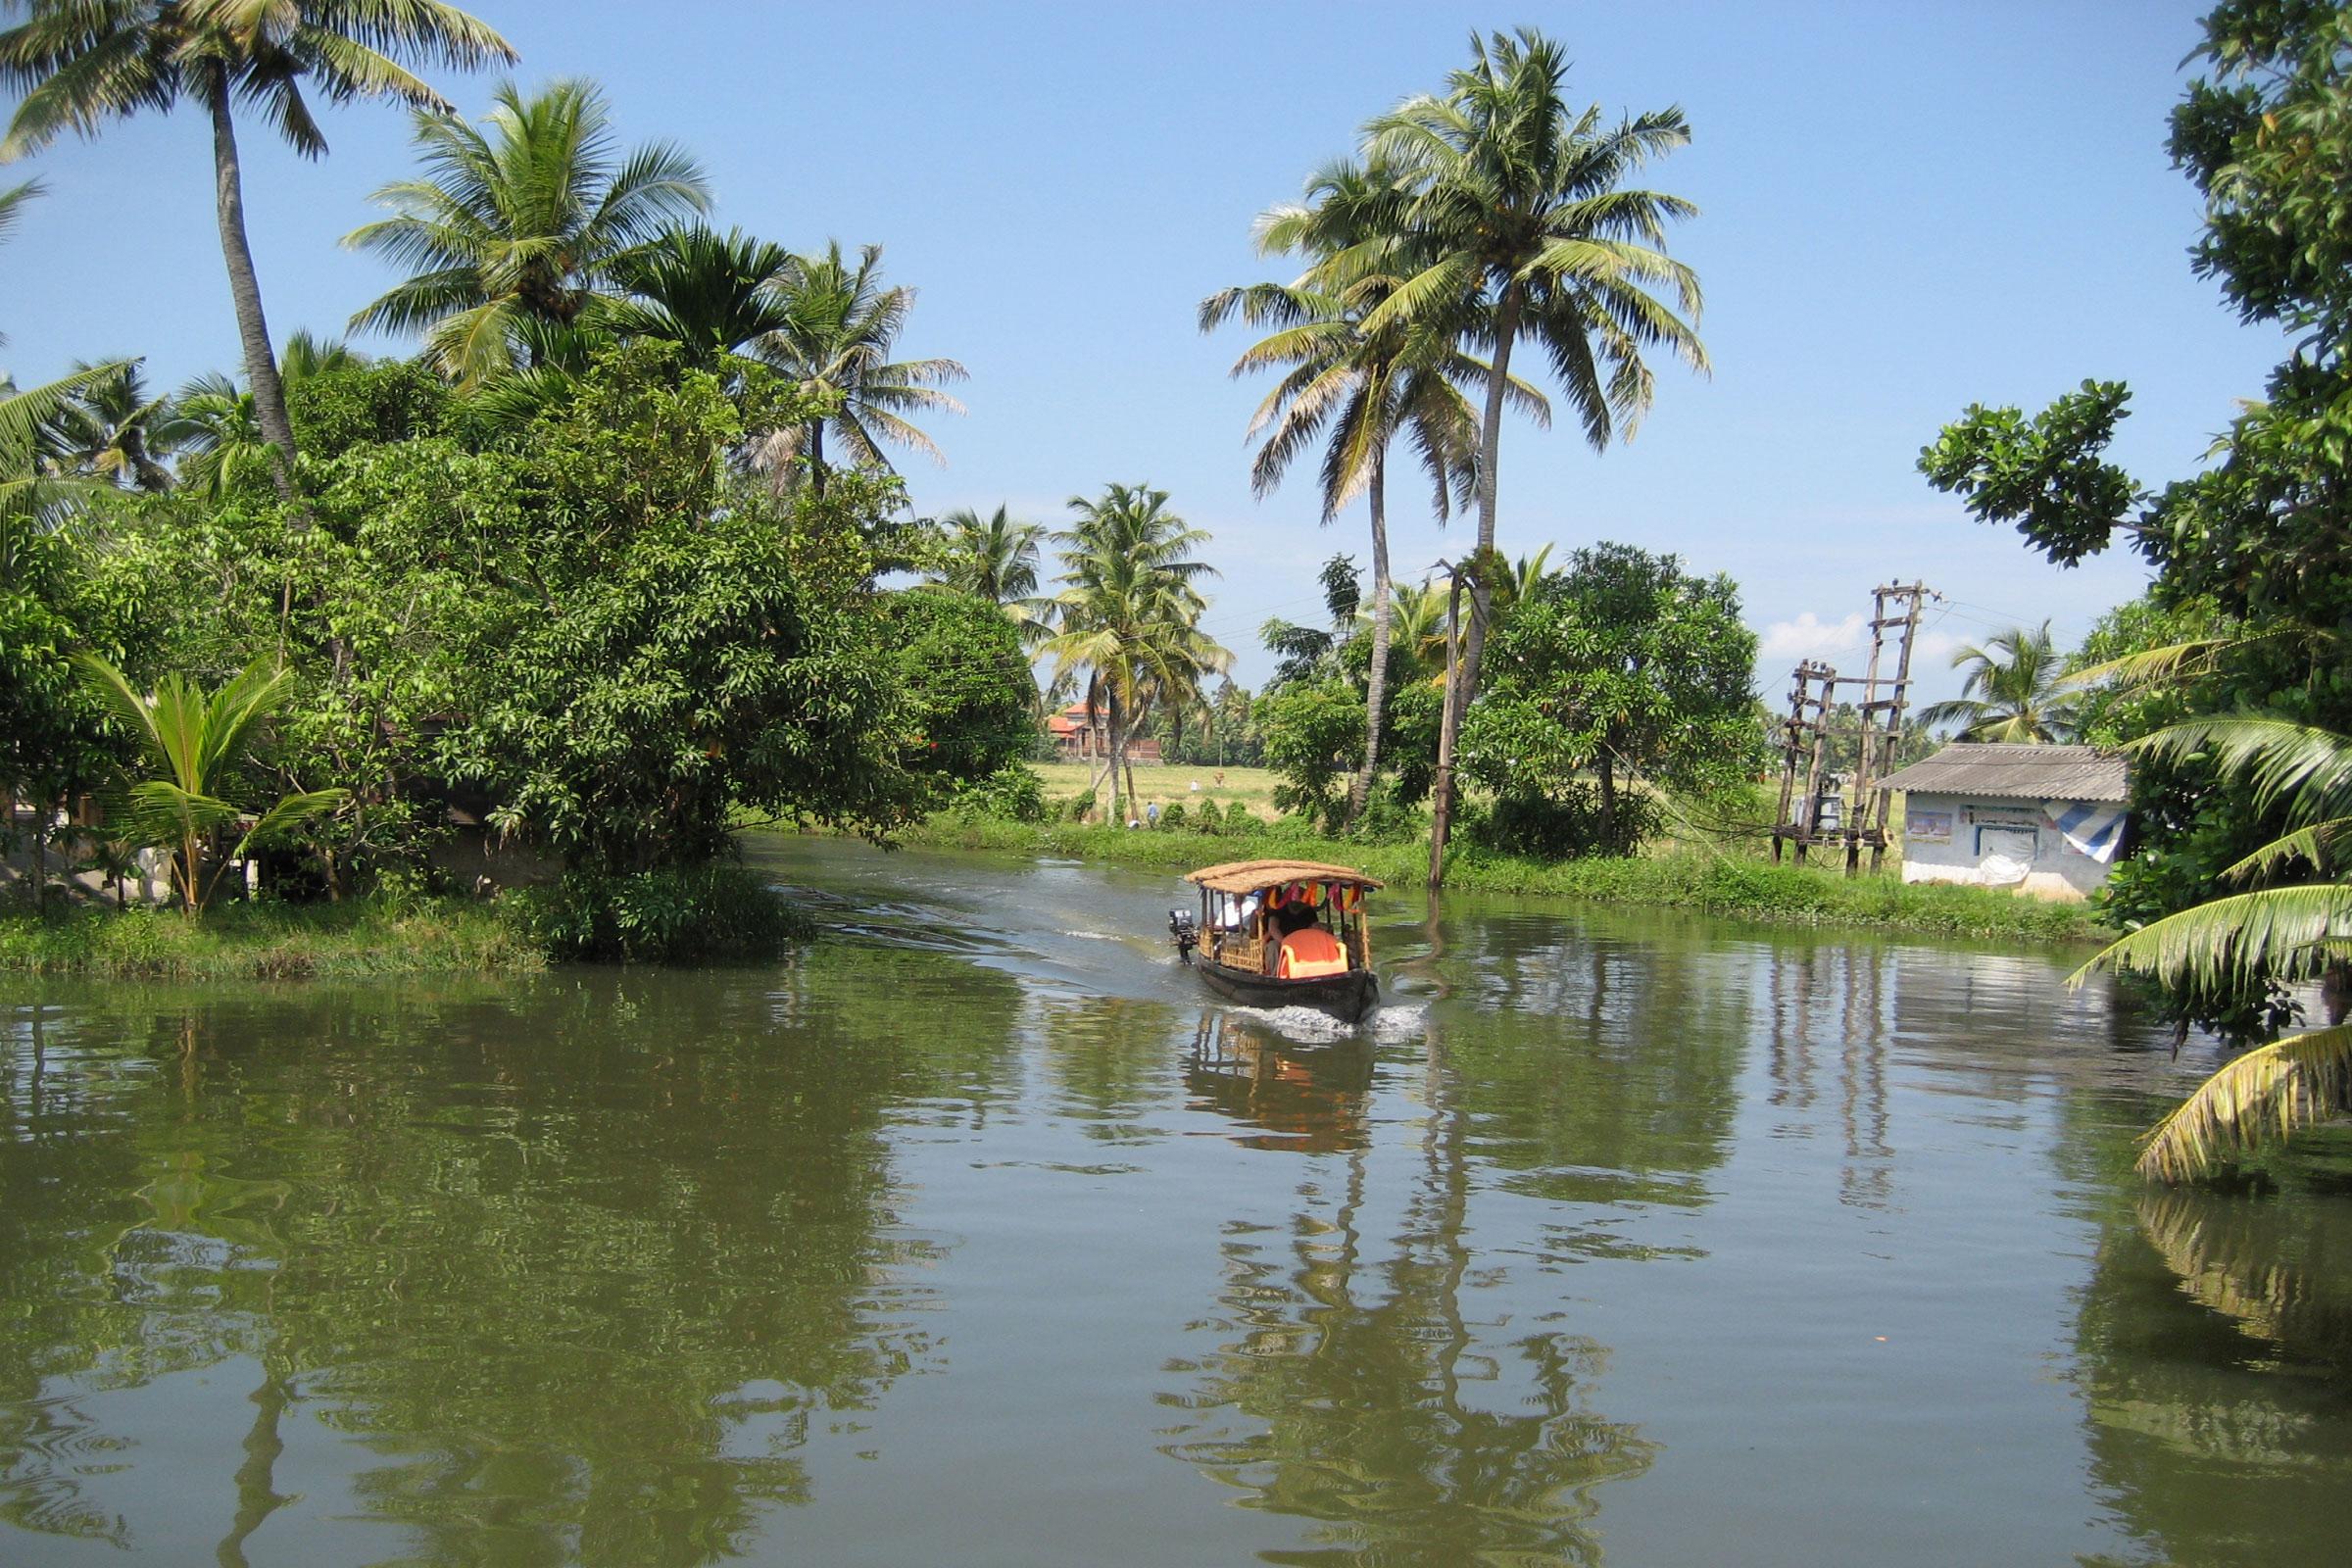 Housebaot,Kumarakom